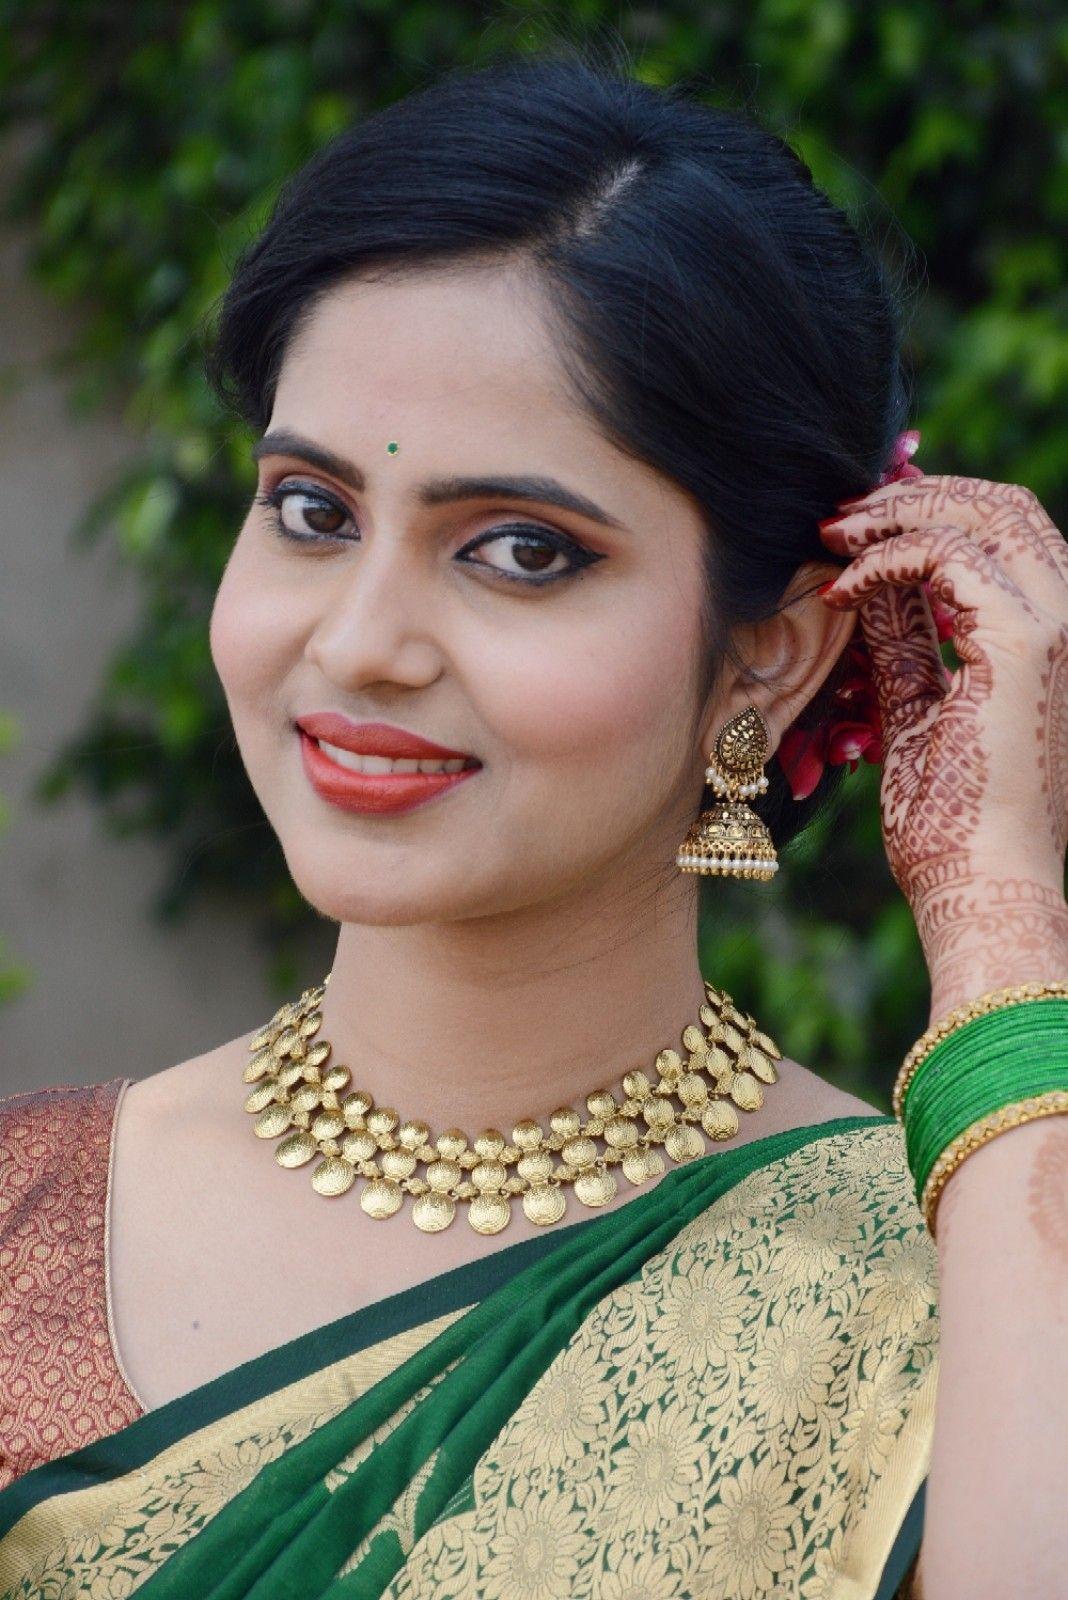 Marathi bride,simple makeup,bridal portrait, Maharashtrian bride ...